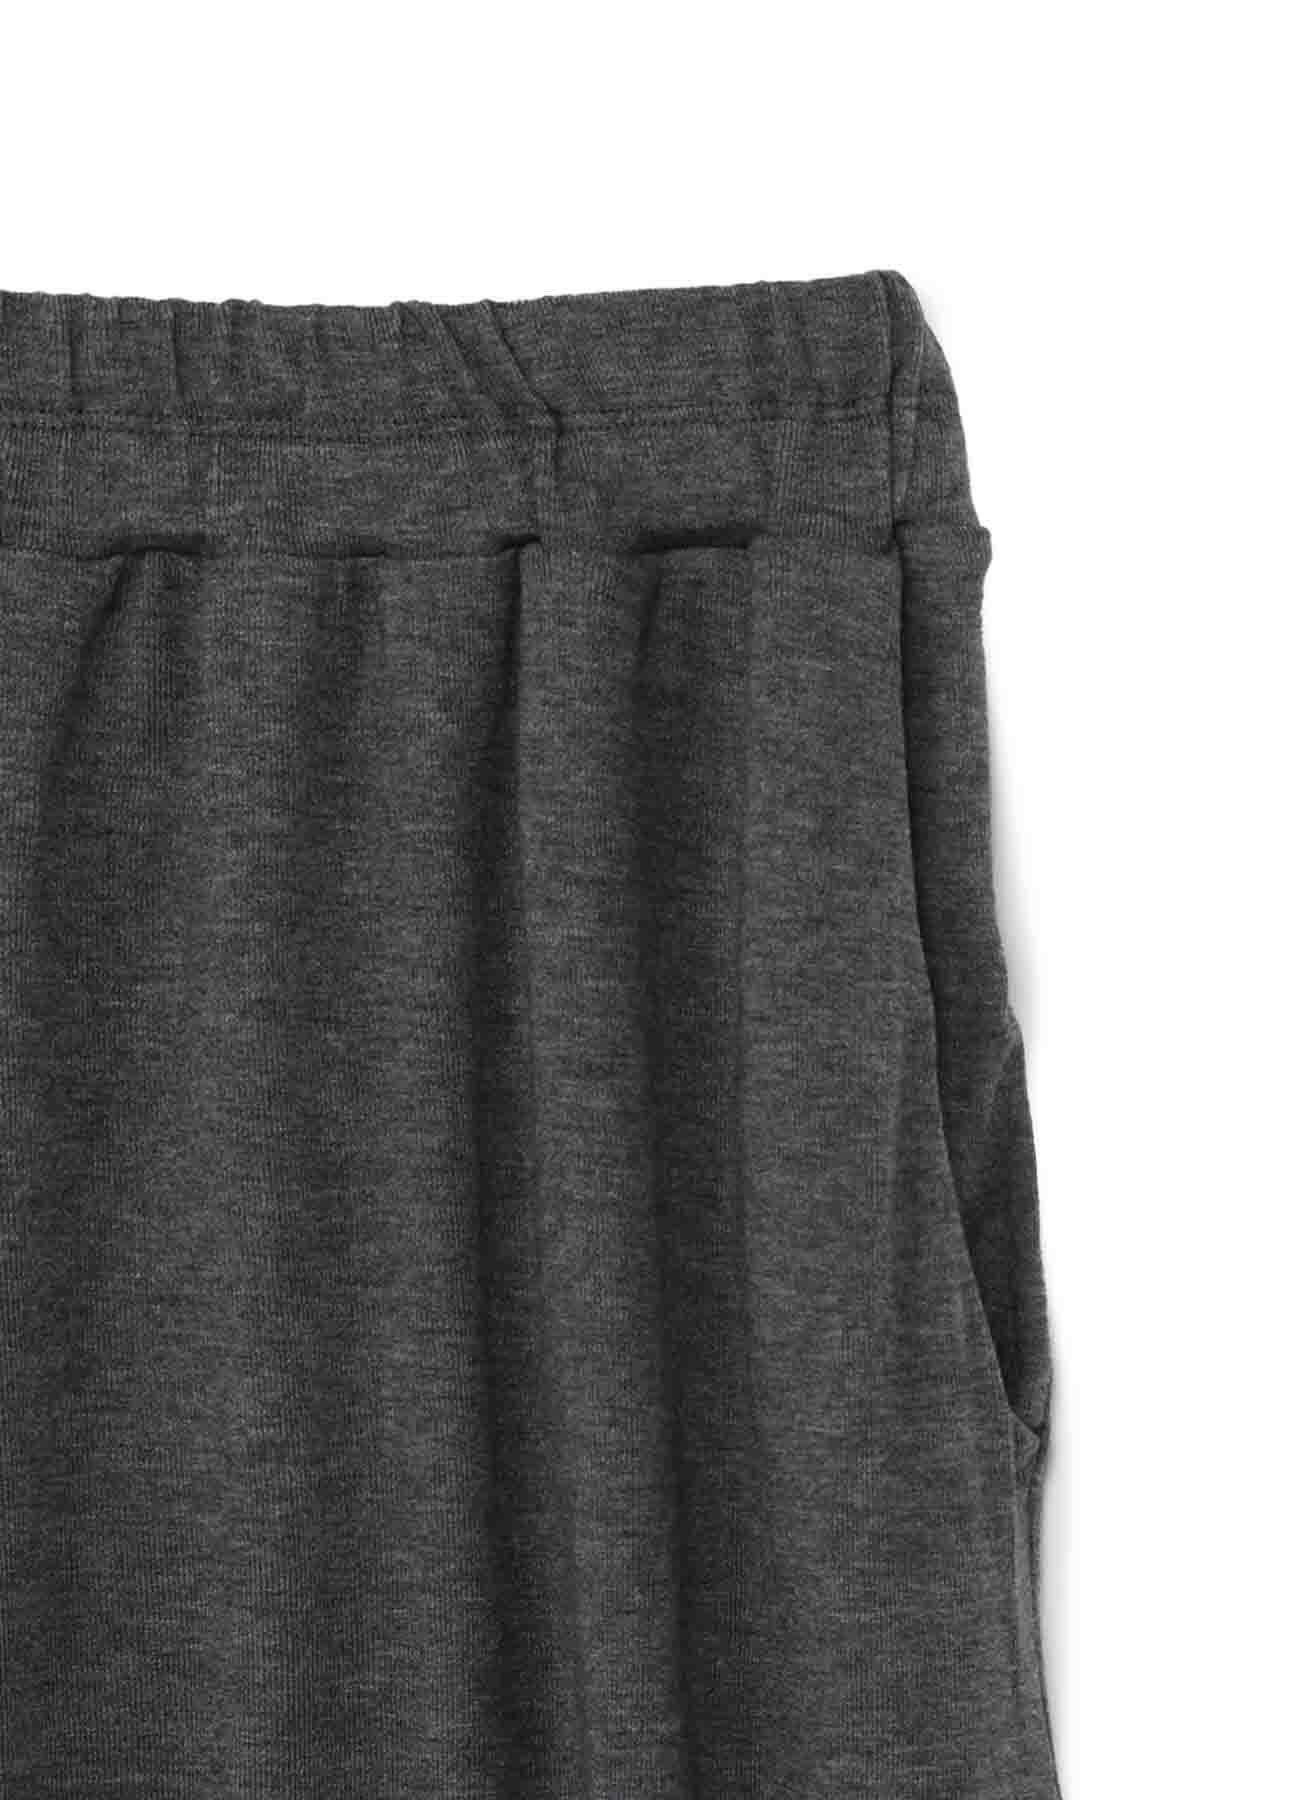 LYOCELL STRETCH RIB JERSEY 4/5 LENGTH WIDE PANTS